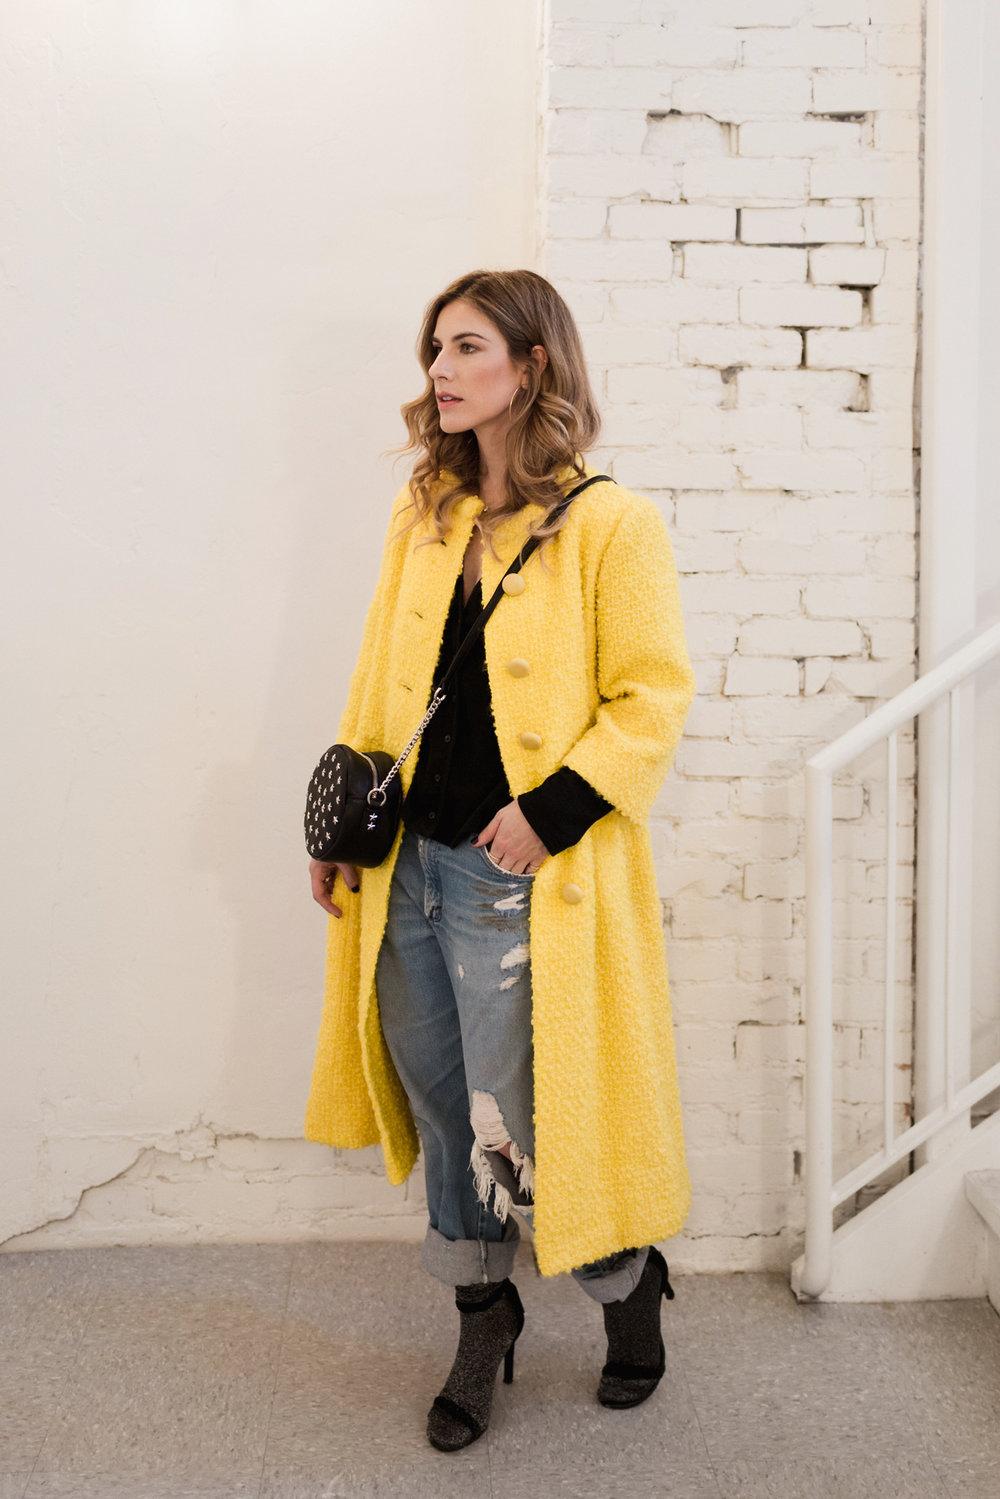 Eldridge Edit_Anna_E_Cottrell_Fashion_Blogger_Yellow_Vintage_Coat_Wrangler_Boyfriend_Jeans_Spring_Trend_2017_Star_Crossbody_Bag_Socks_with_Heels_Trend_MGB_Photo_3.jpg